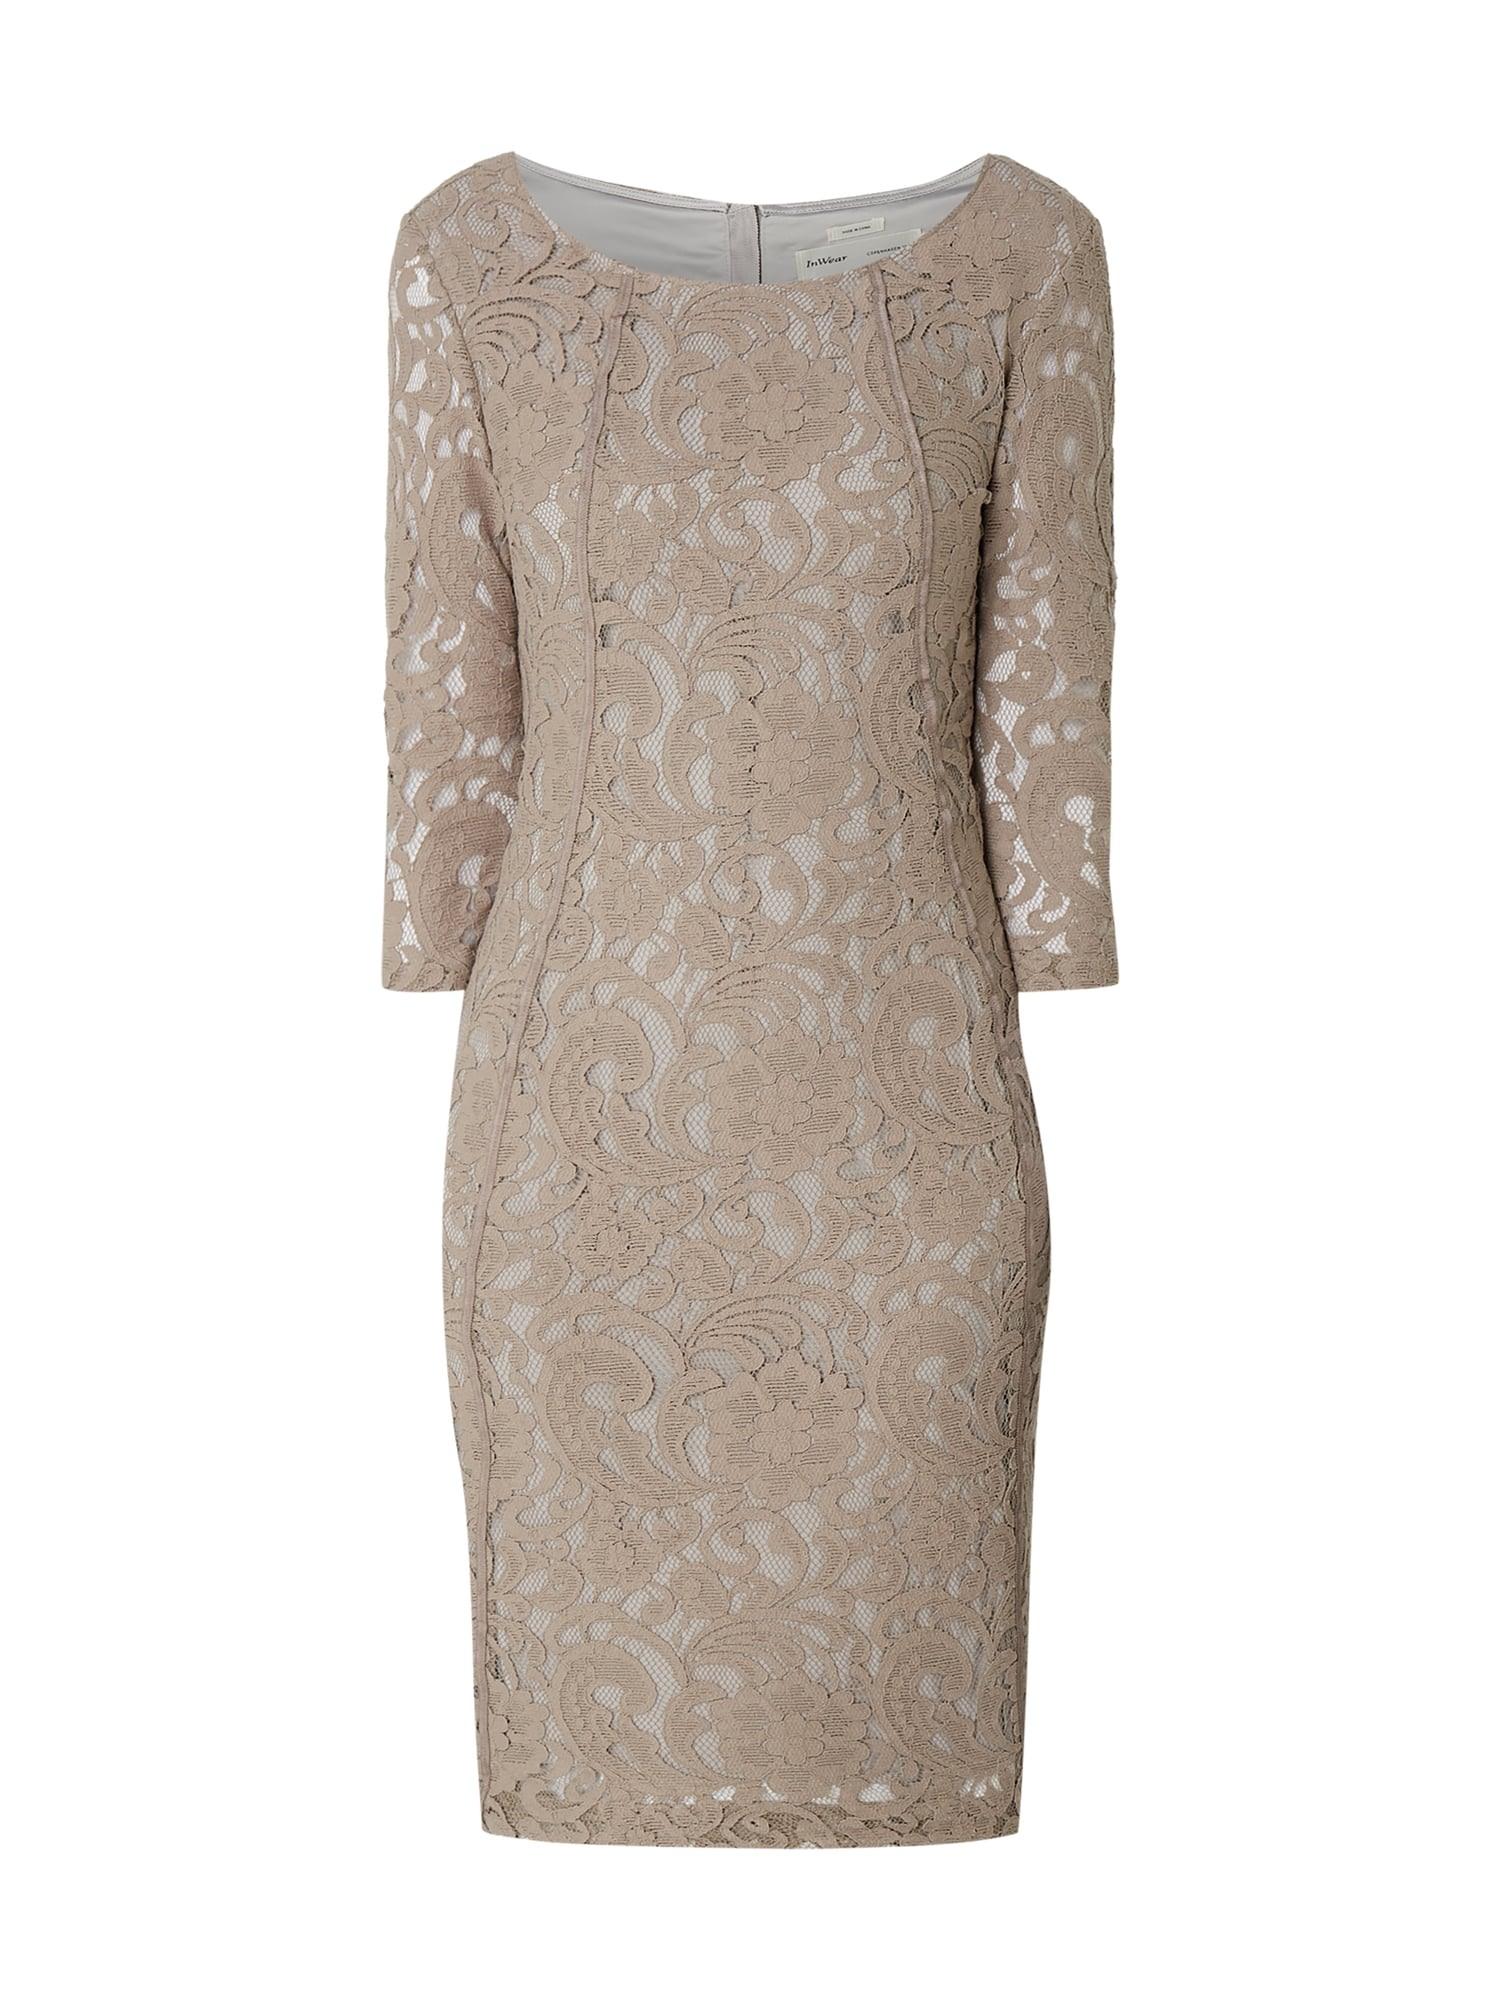 13 Einfach Kleid Grau Spitze Spezialgebiet Schön Kleid Grau Spitze Stylish